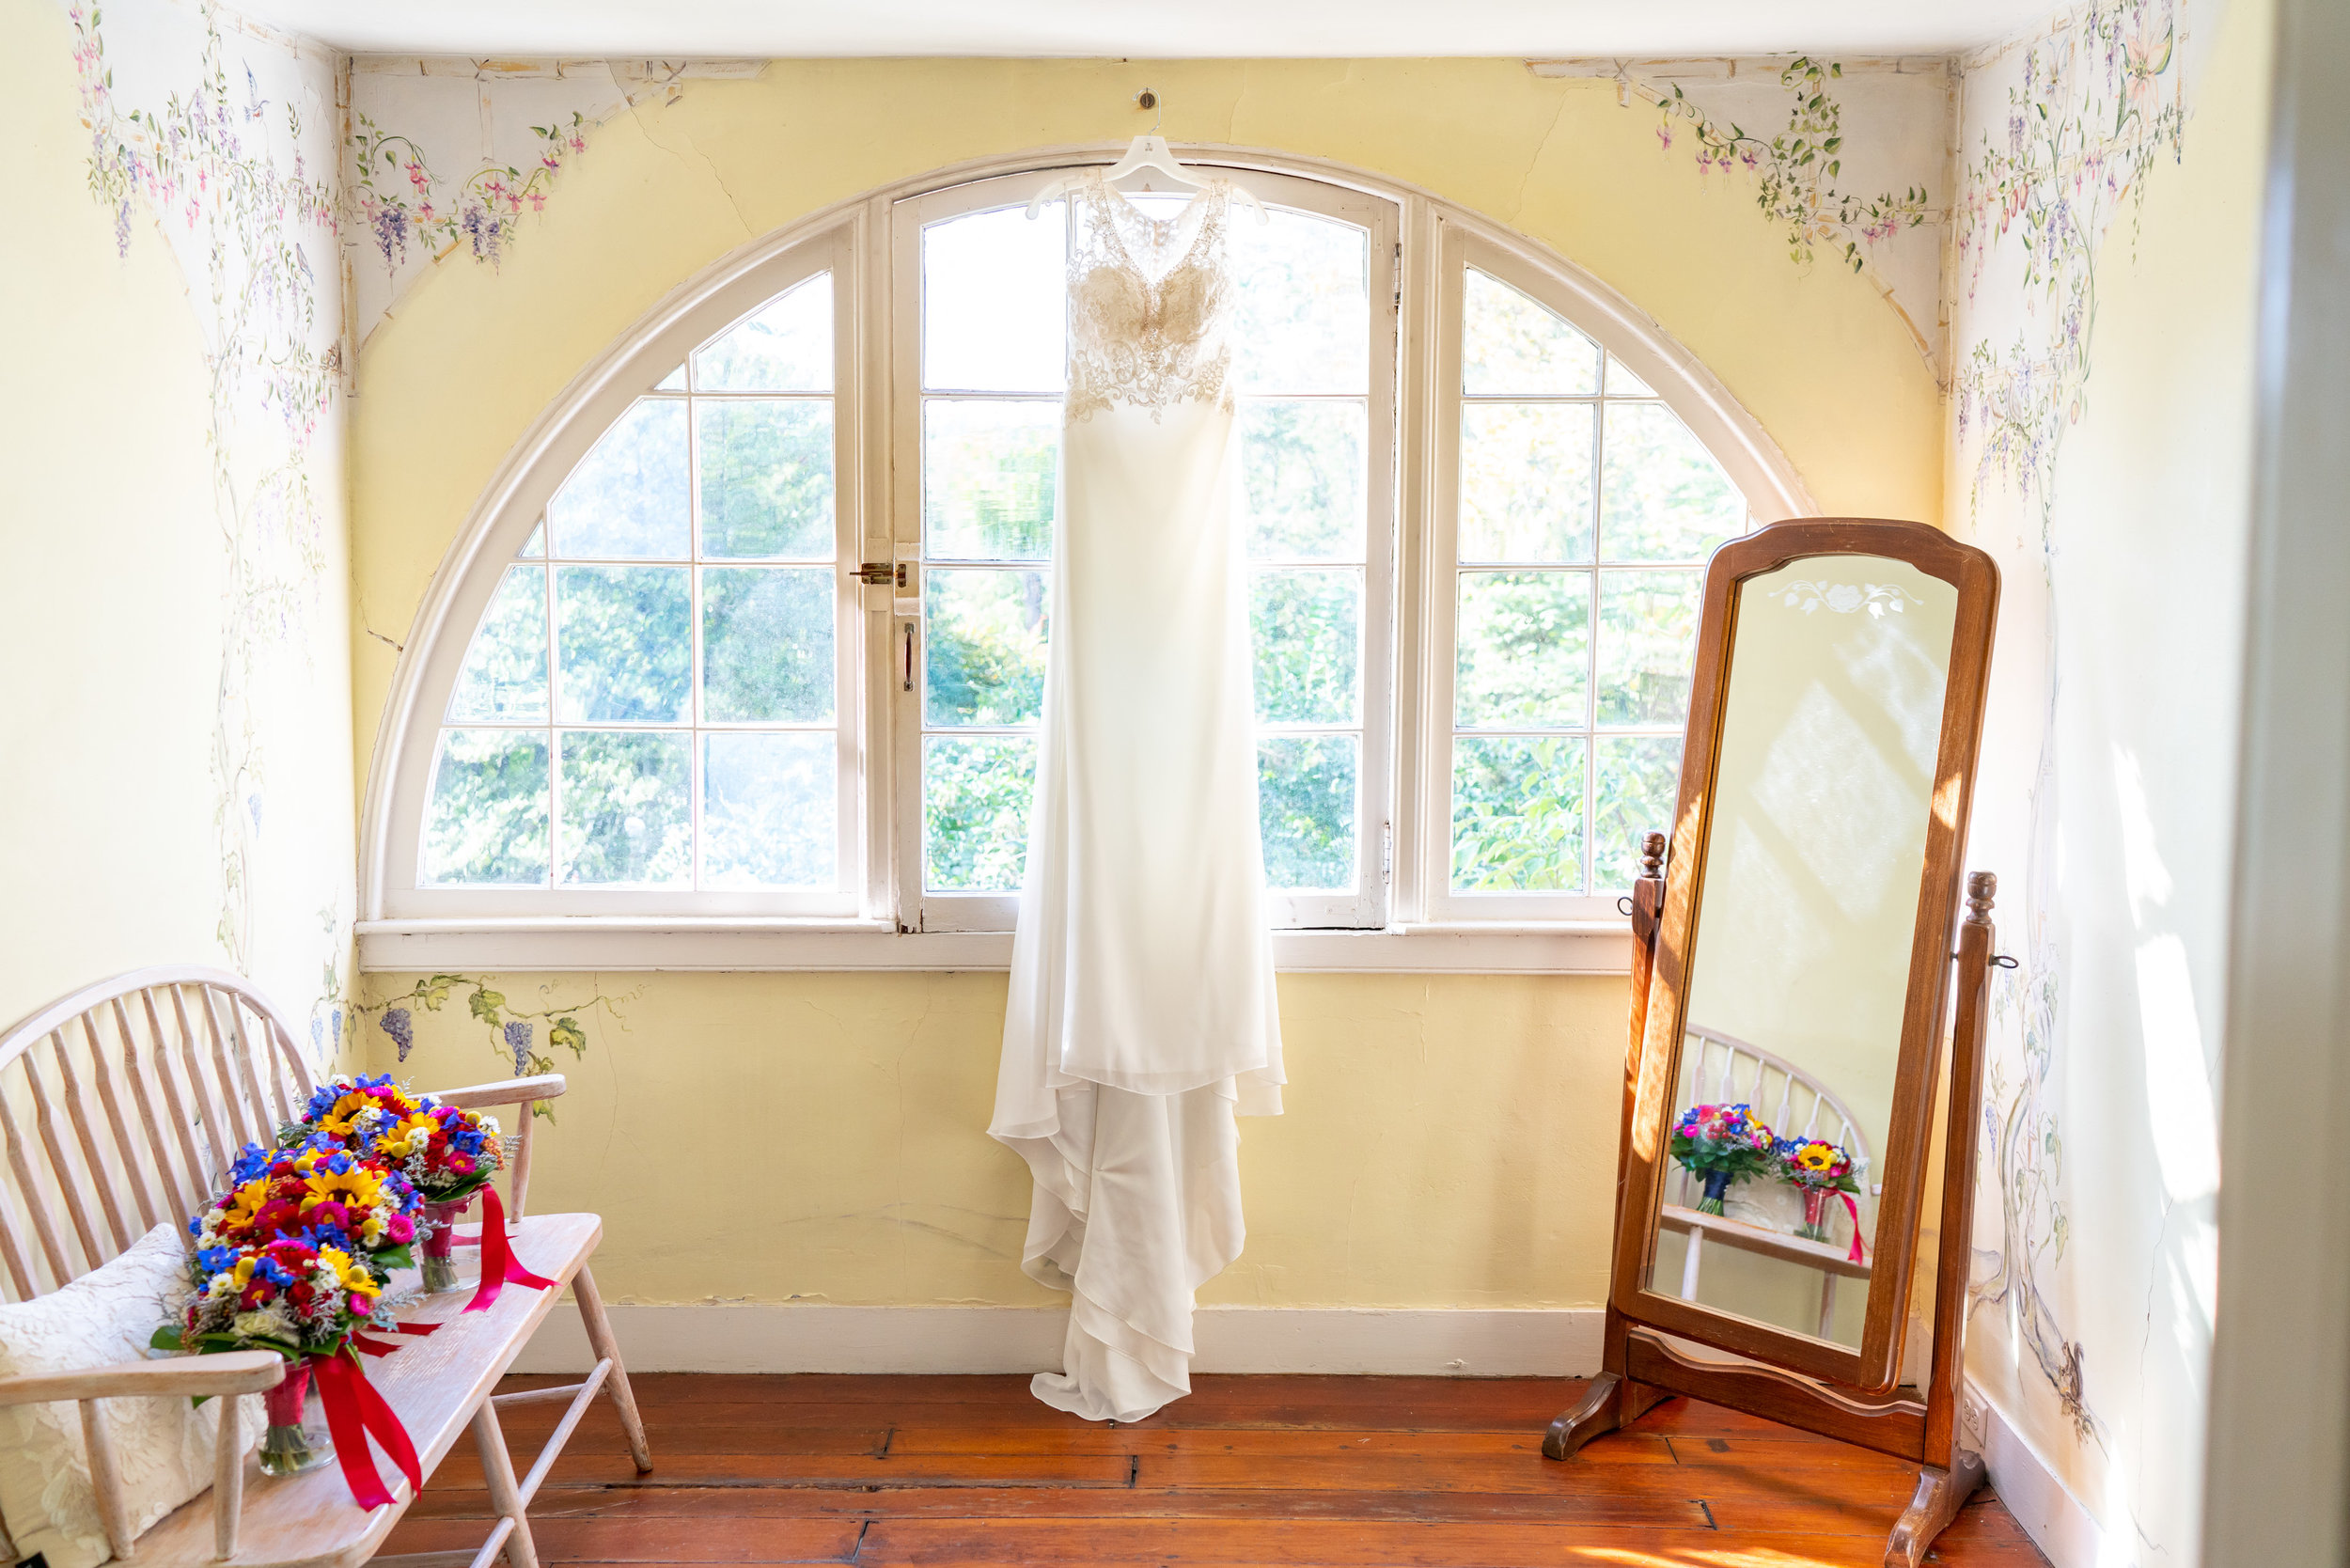 Bride's Morilee Myka gown hanging in window at Elkridge Furnace inn (similar to Keisha gown)